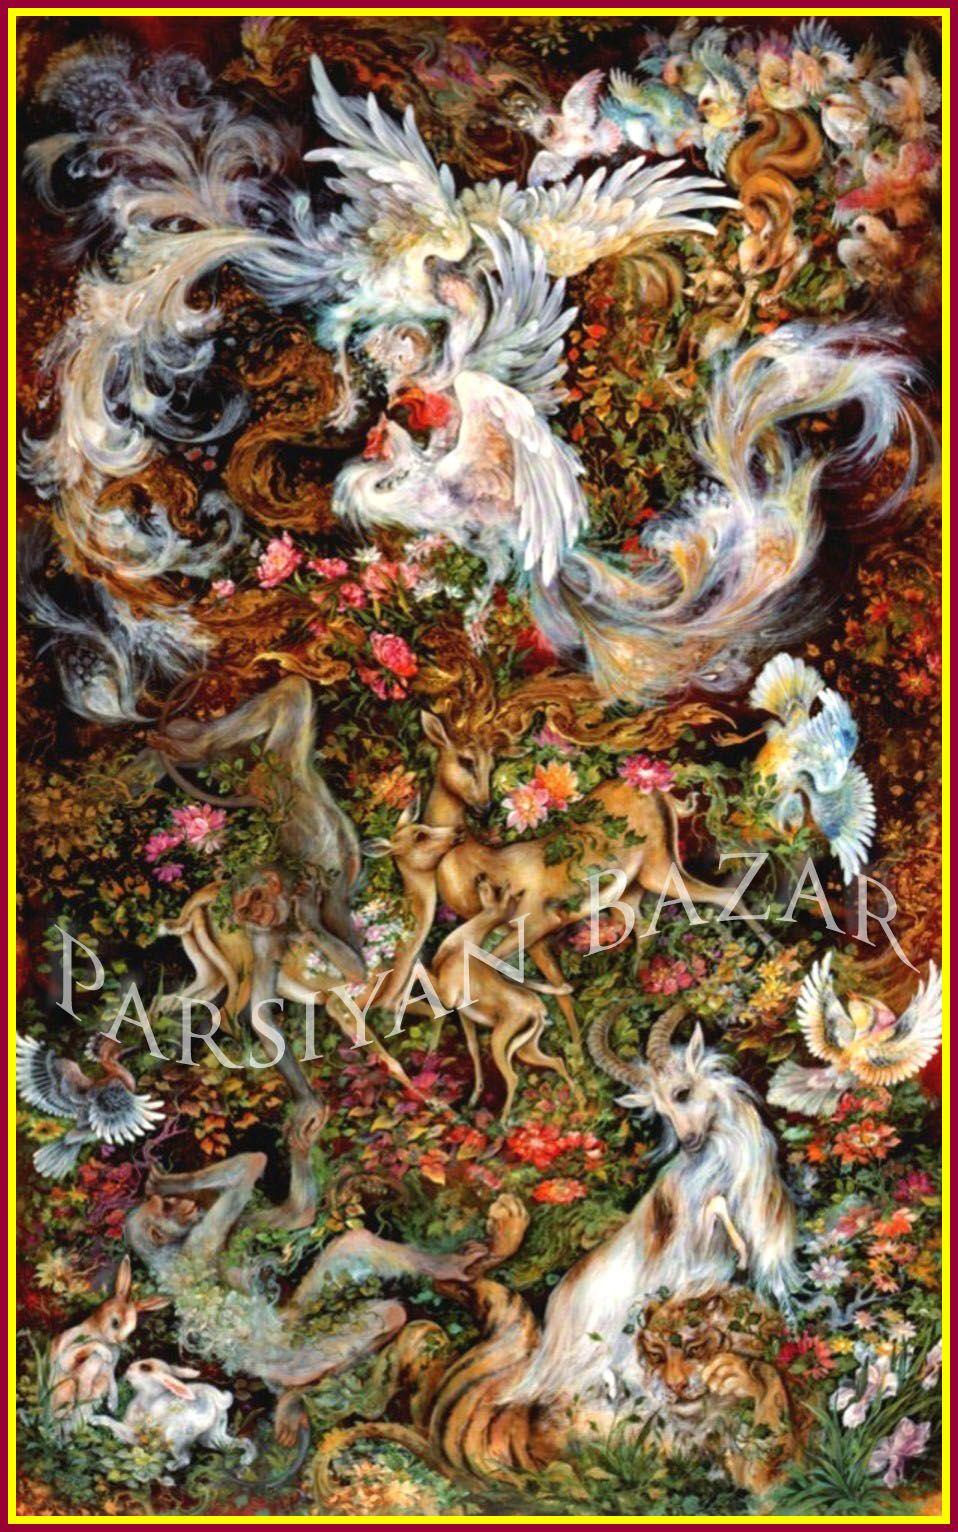 Mahmoud Farshchian: Garden of Eden Art print # 243 | Mahmoud ...